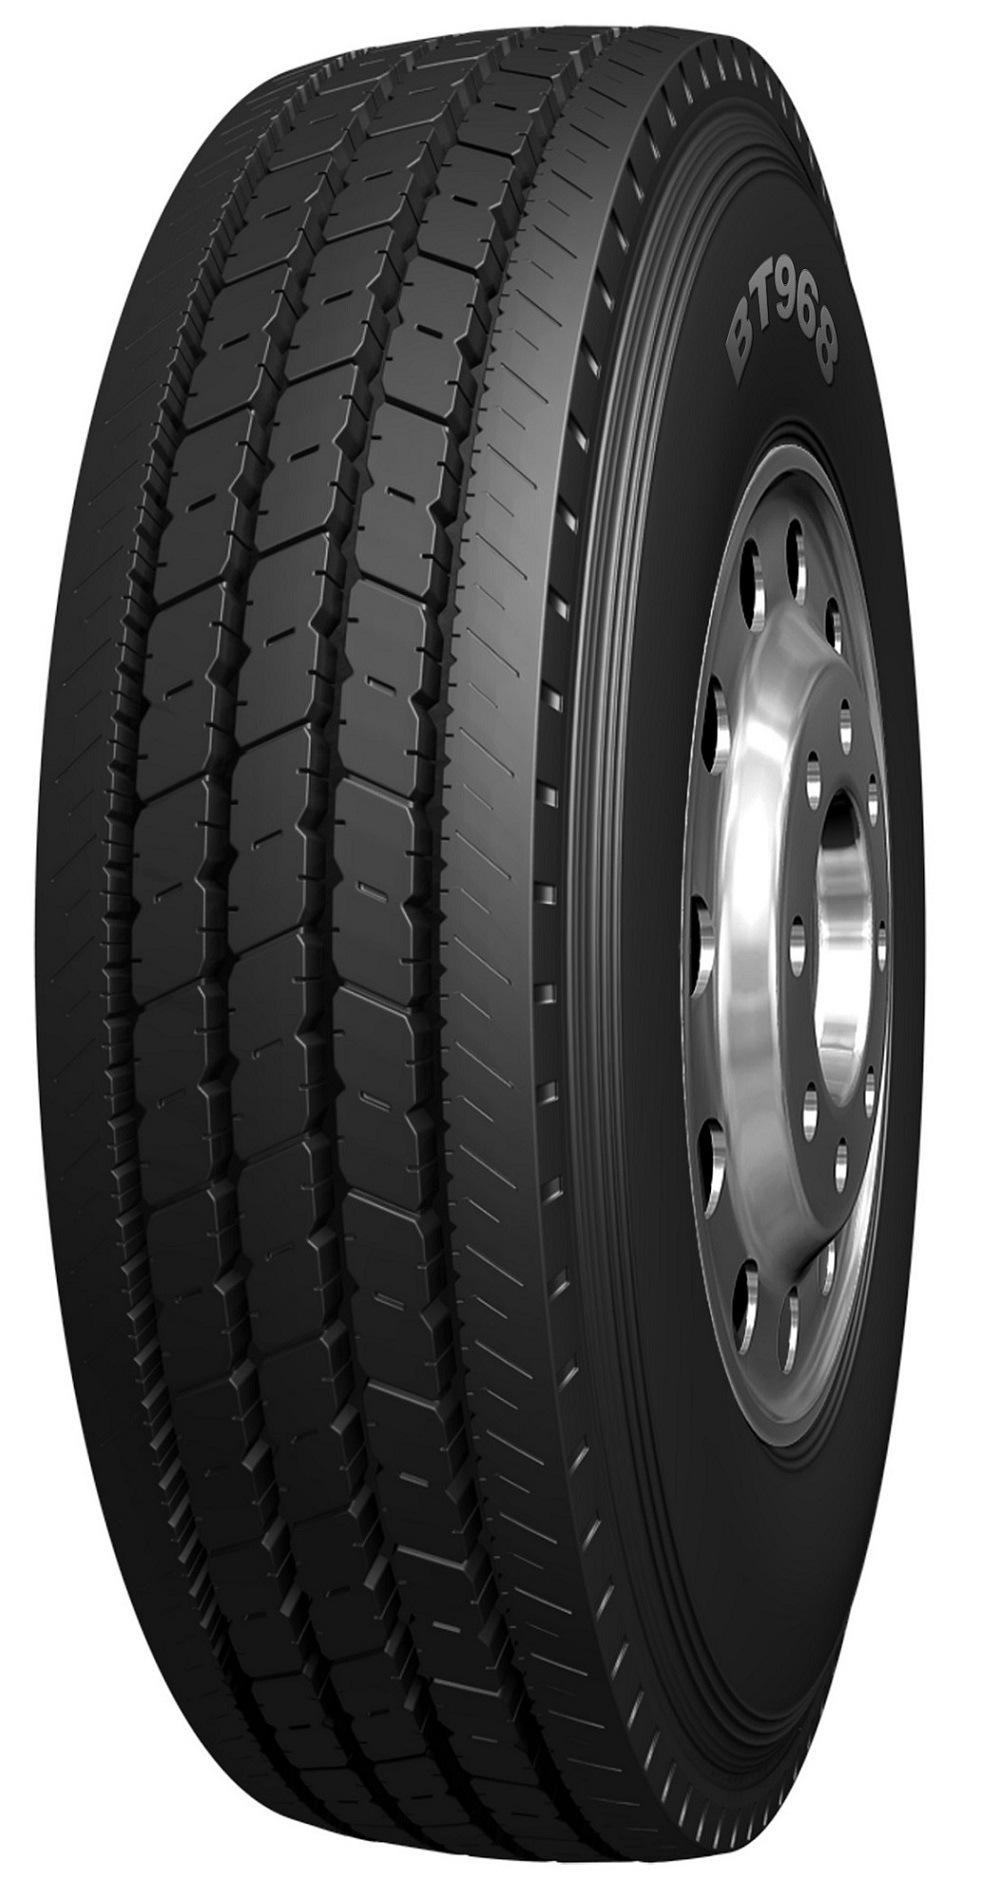 Heavy Load Boto Drive Trailer TBR Radial Truck Tyre (315/80R22.5, 385/65R22.5, 7.50R16, 1200R24...)